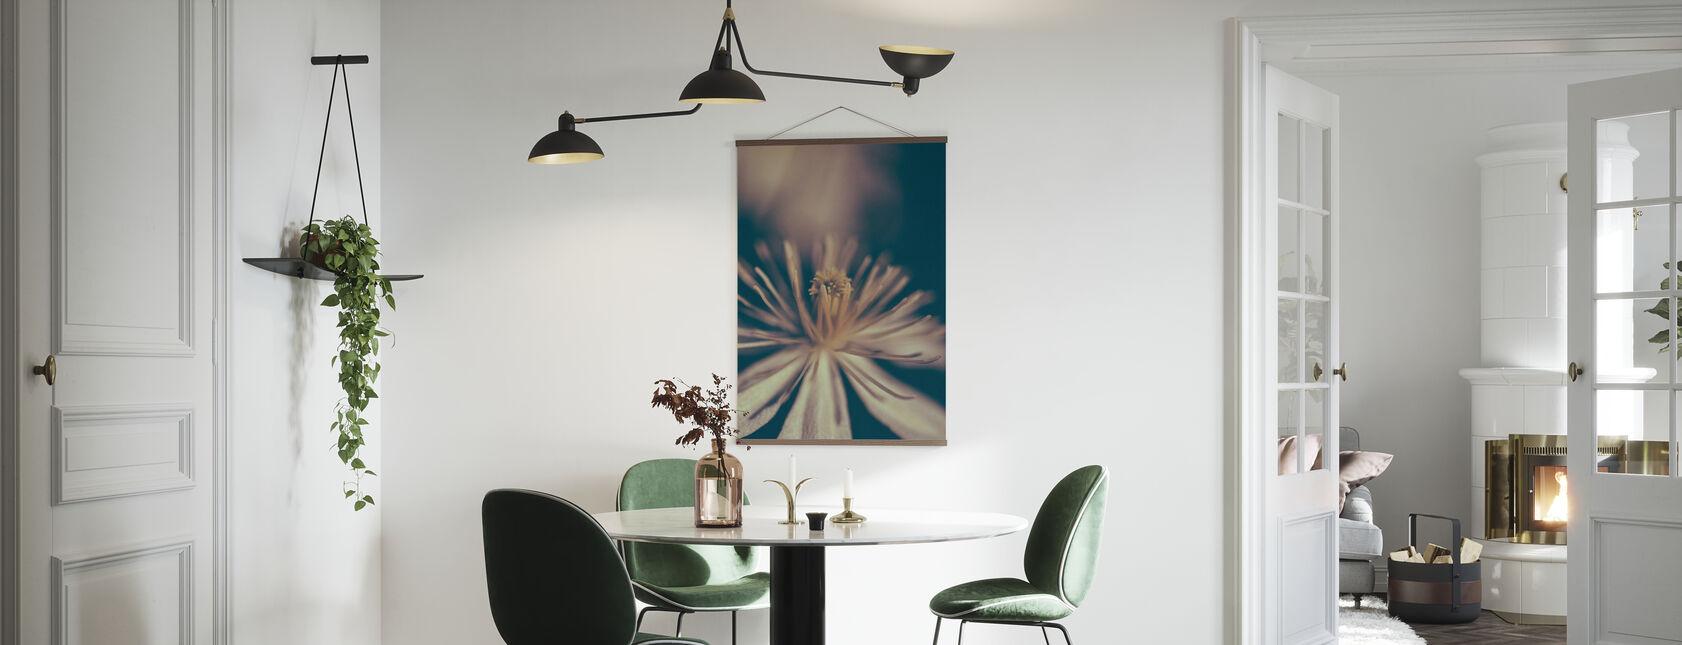 Retro blomma - Poster - Kök